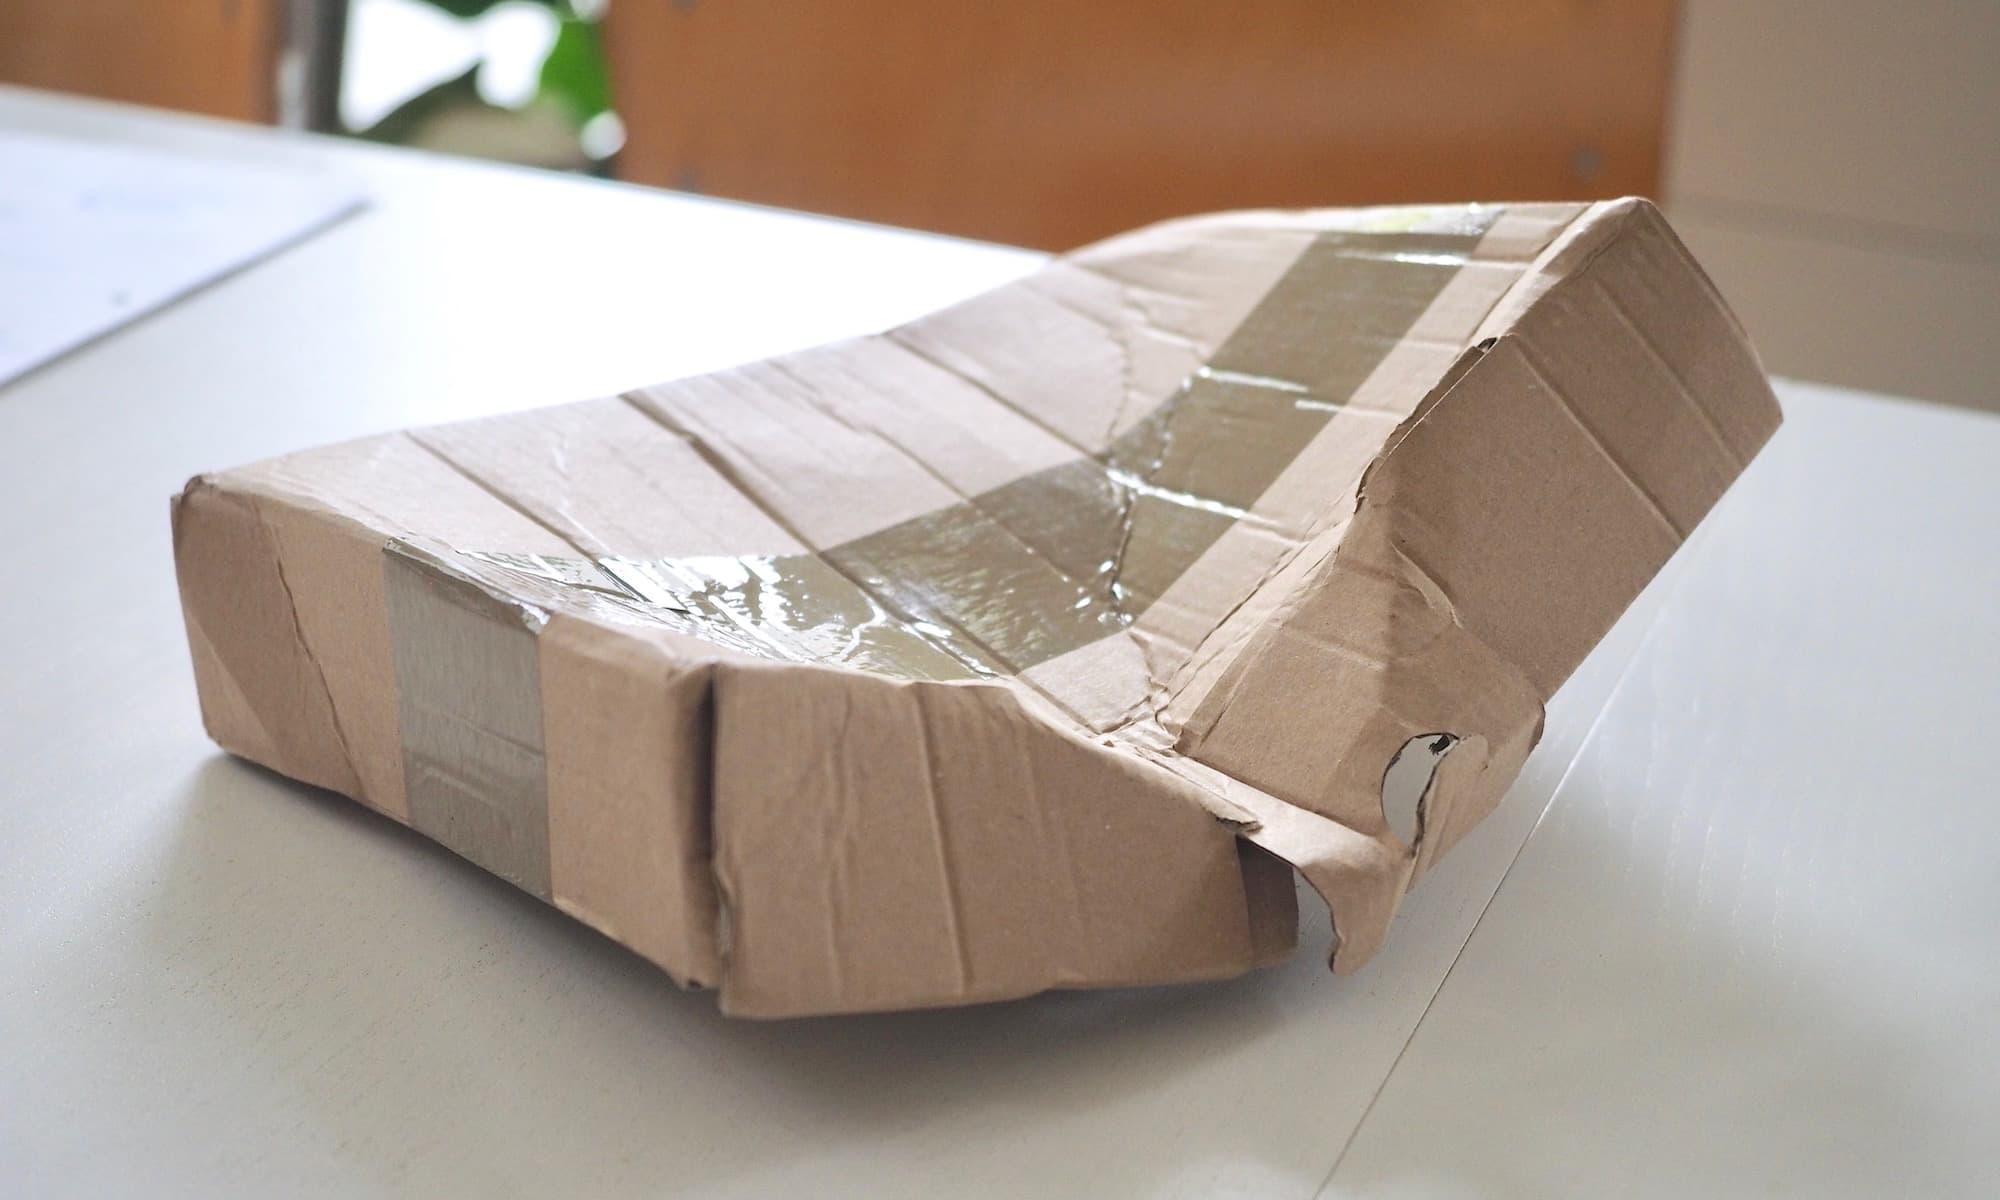 GLS Paket Harakiri im Briefkasten | Foto: konsensor.de